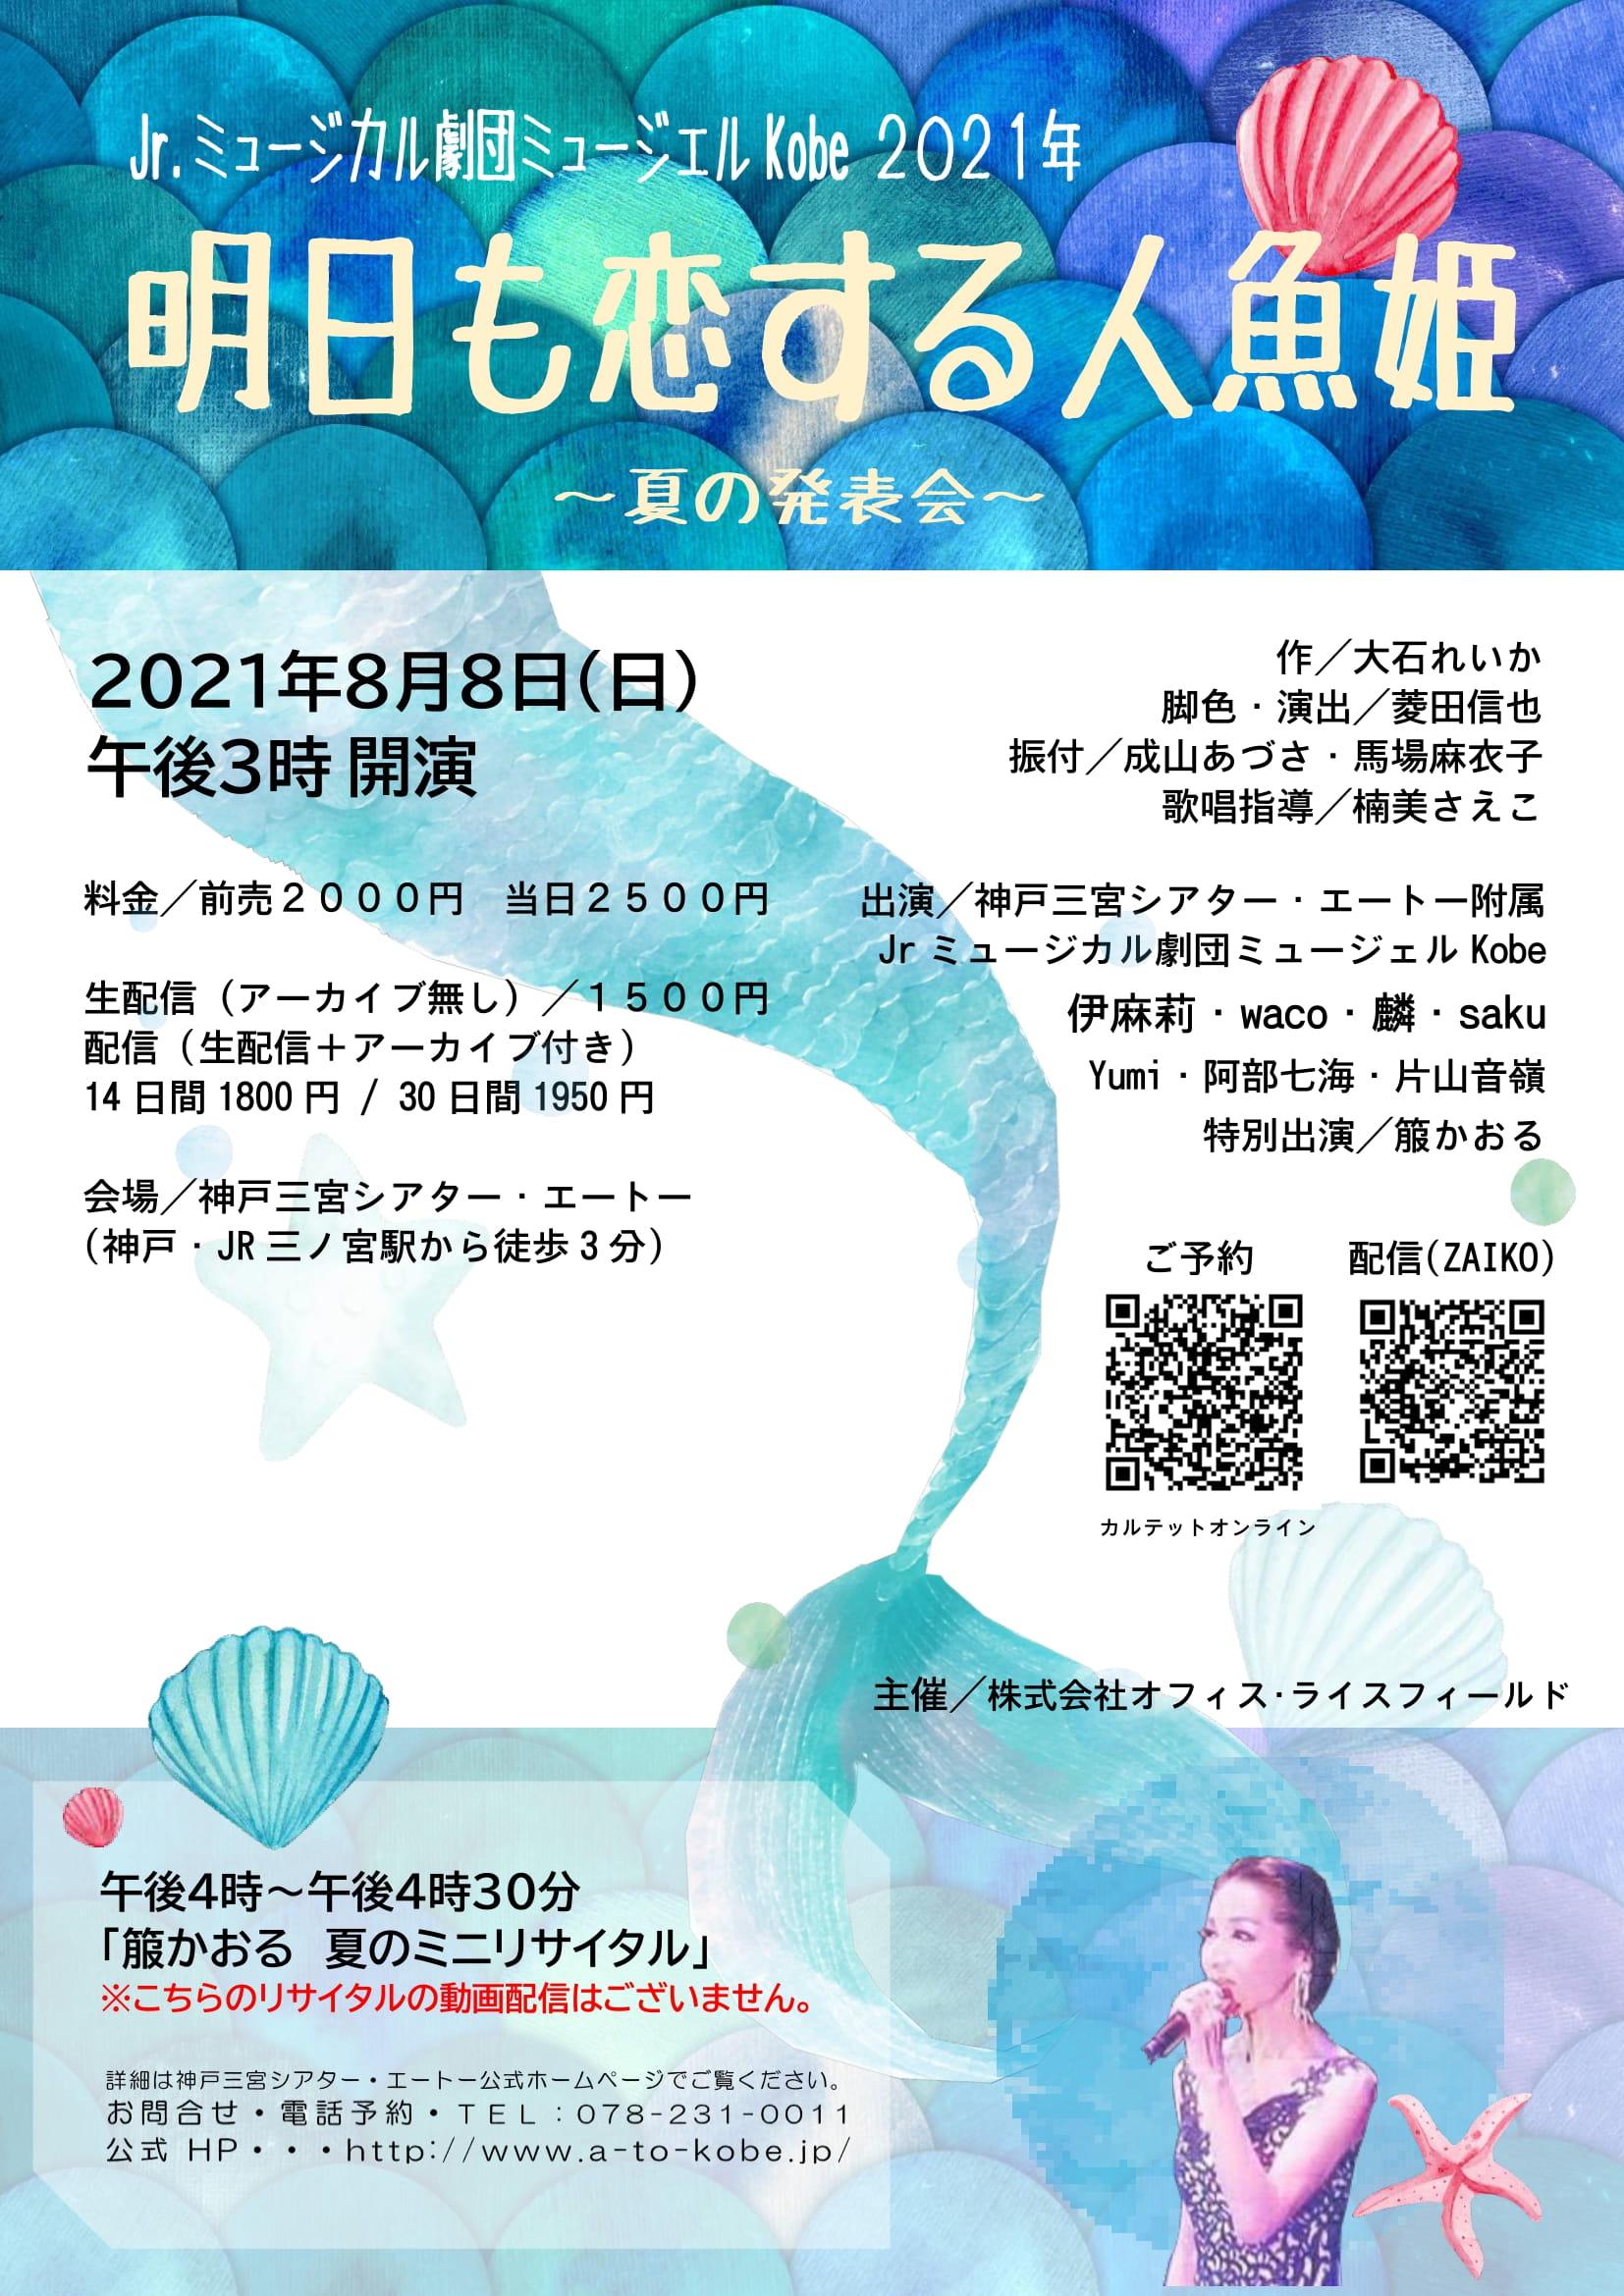 Jr.ミュージカル劇団ミュージェル Kobe 2021年『明日も恋する人魚姫』